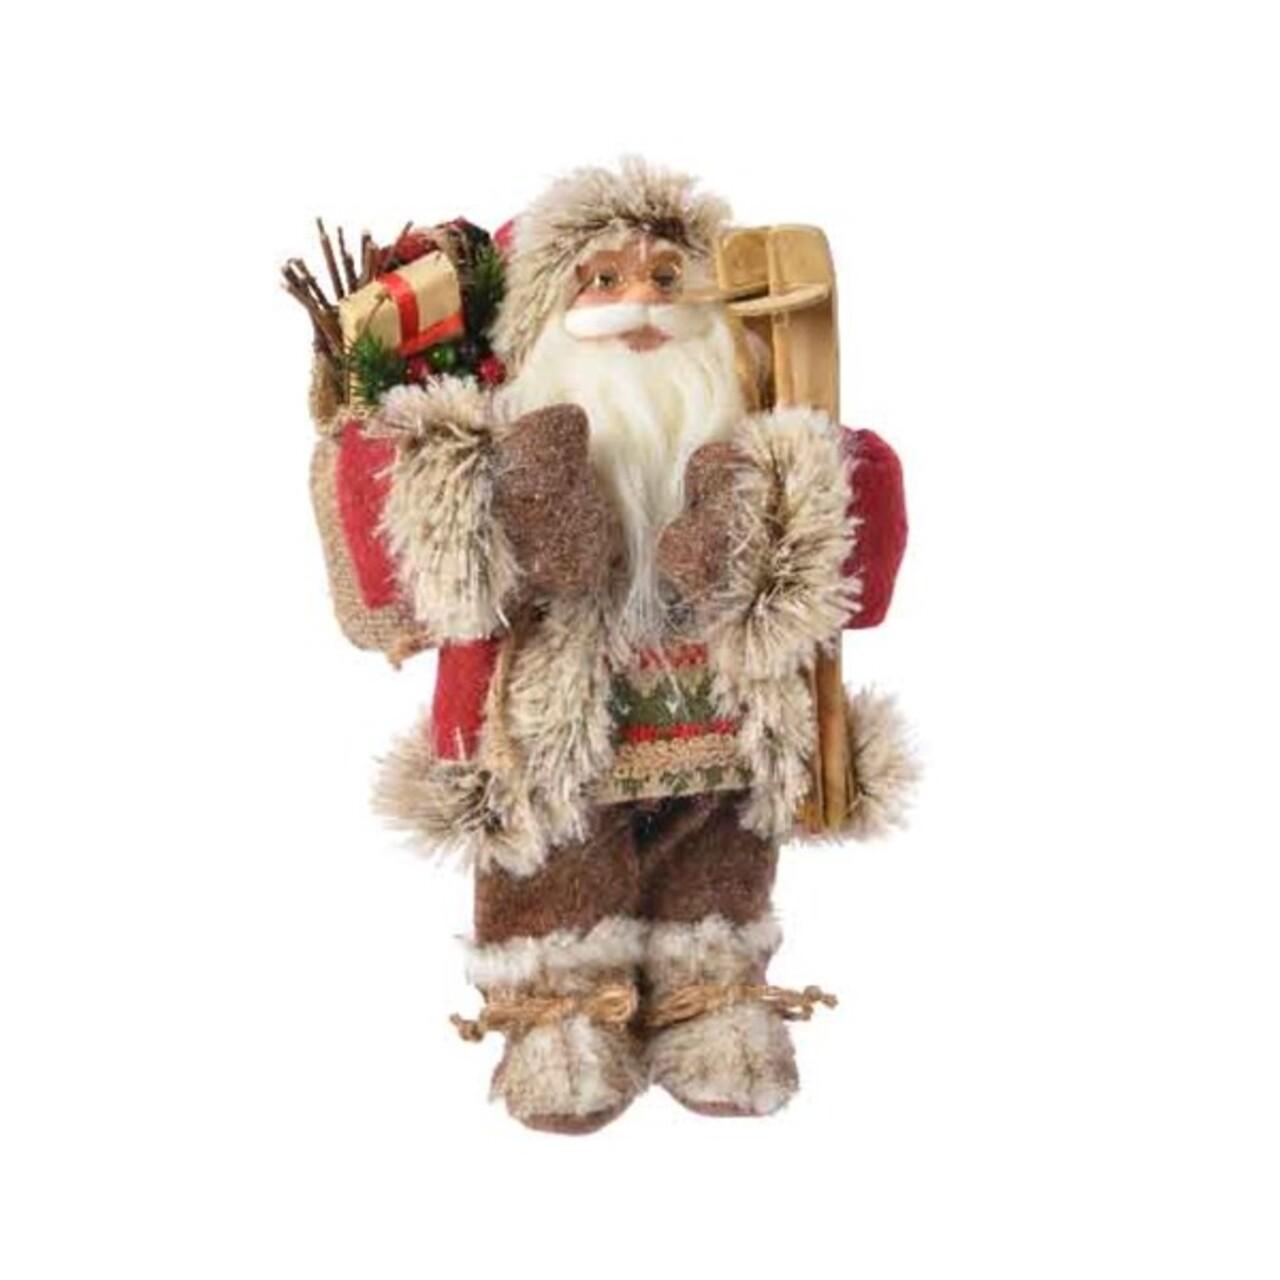 Decoratiune Santa country style, Decoris, H30 cm, poliester, multicolor